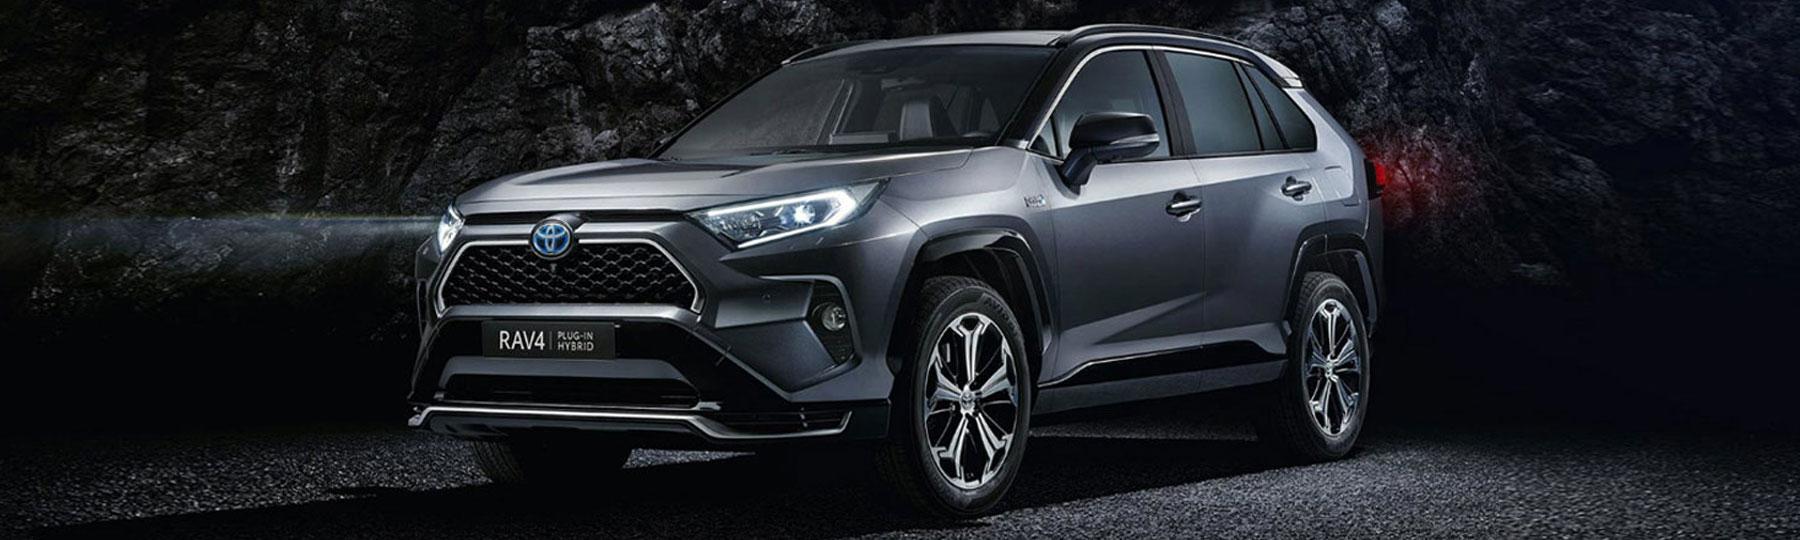 All New Toyota RAV4 Plug-in Business Offer